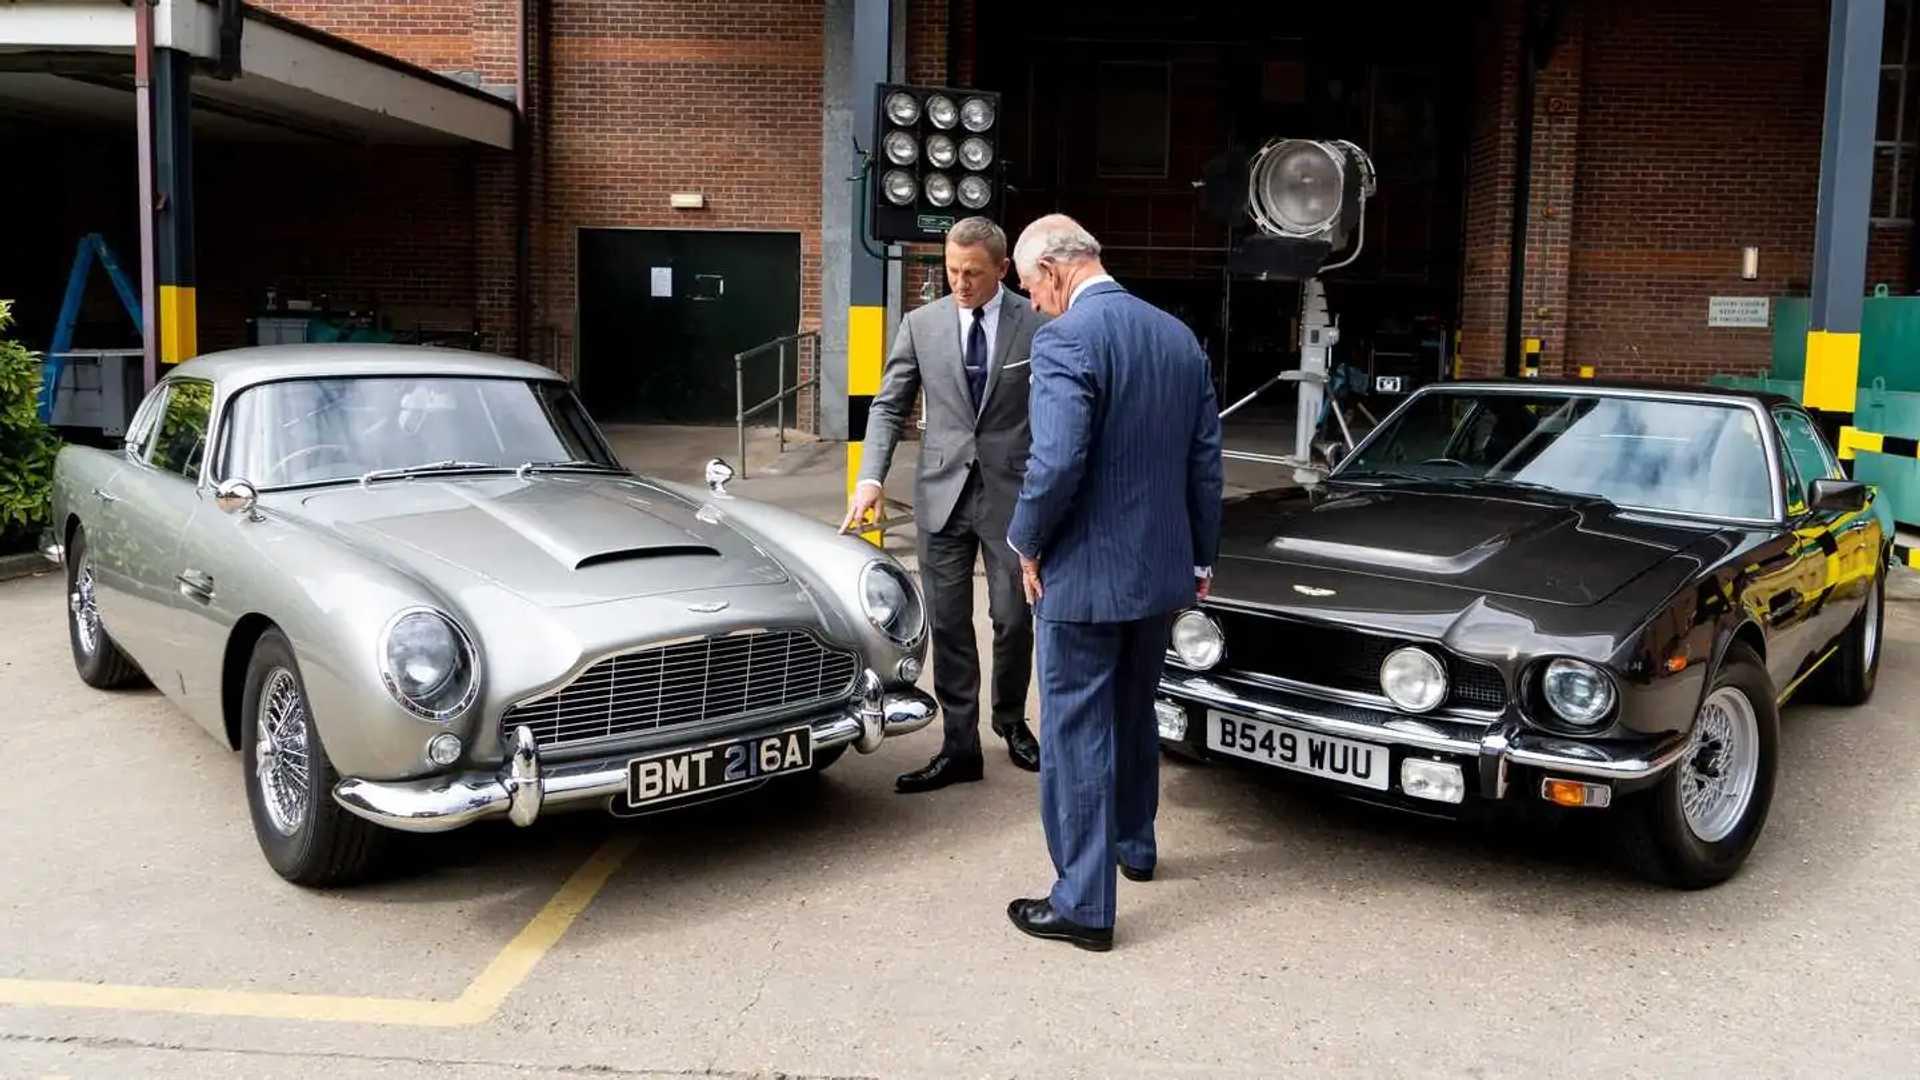 Aston Martin Confirms Bond 25 Cars During Royal Set Visit